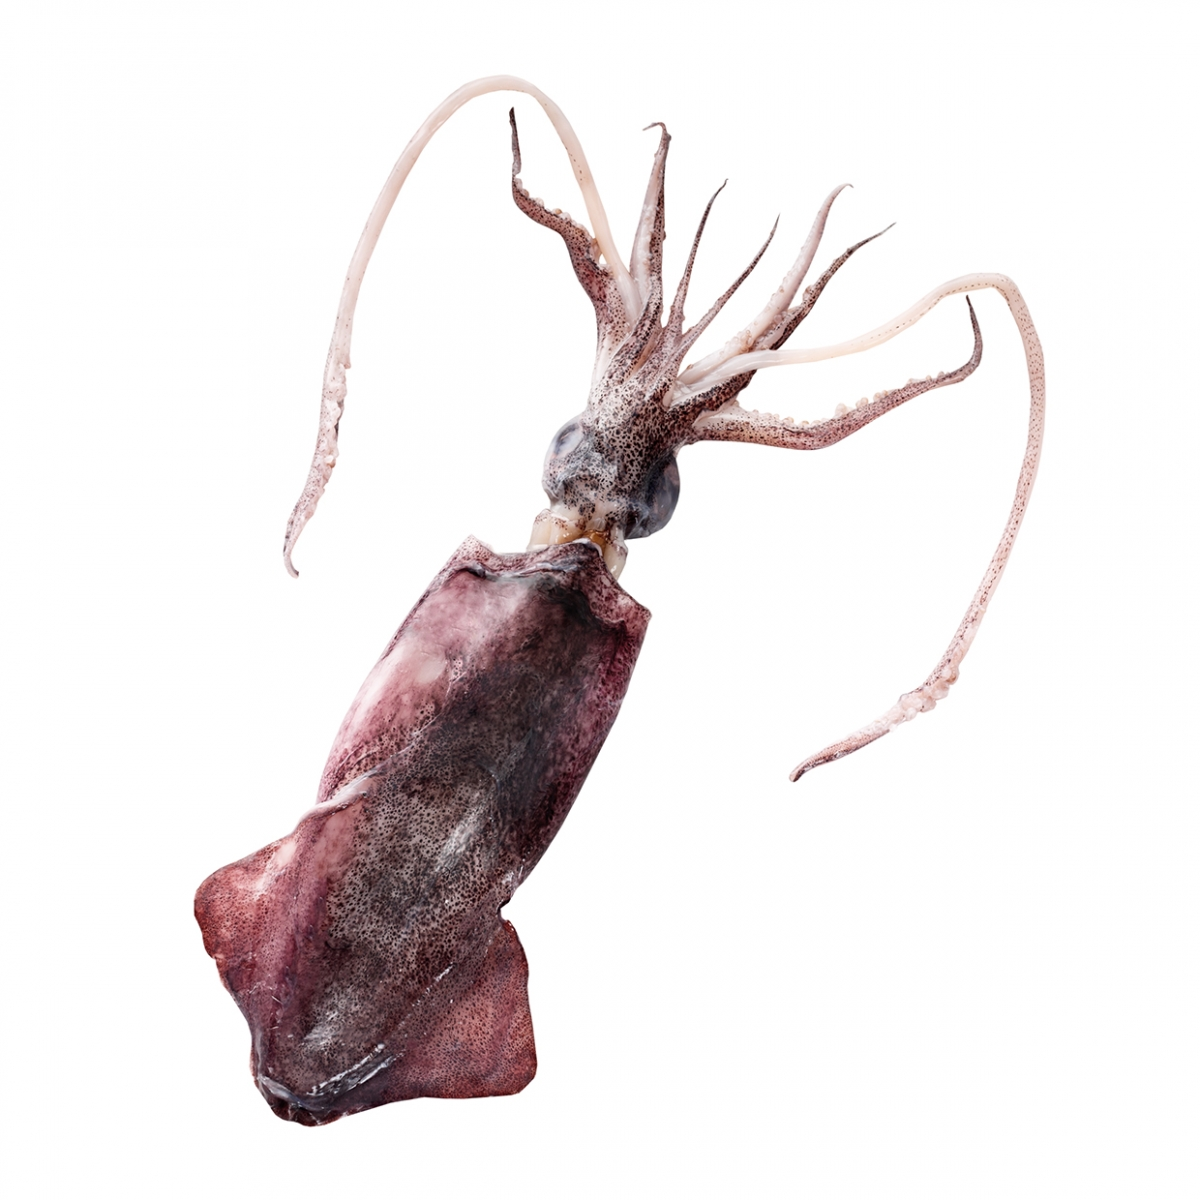 Imagen en la que se ve un calamar